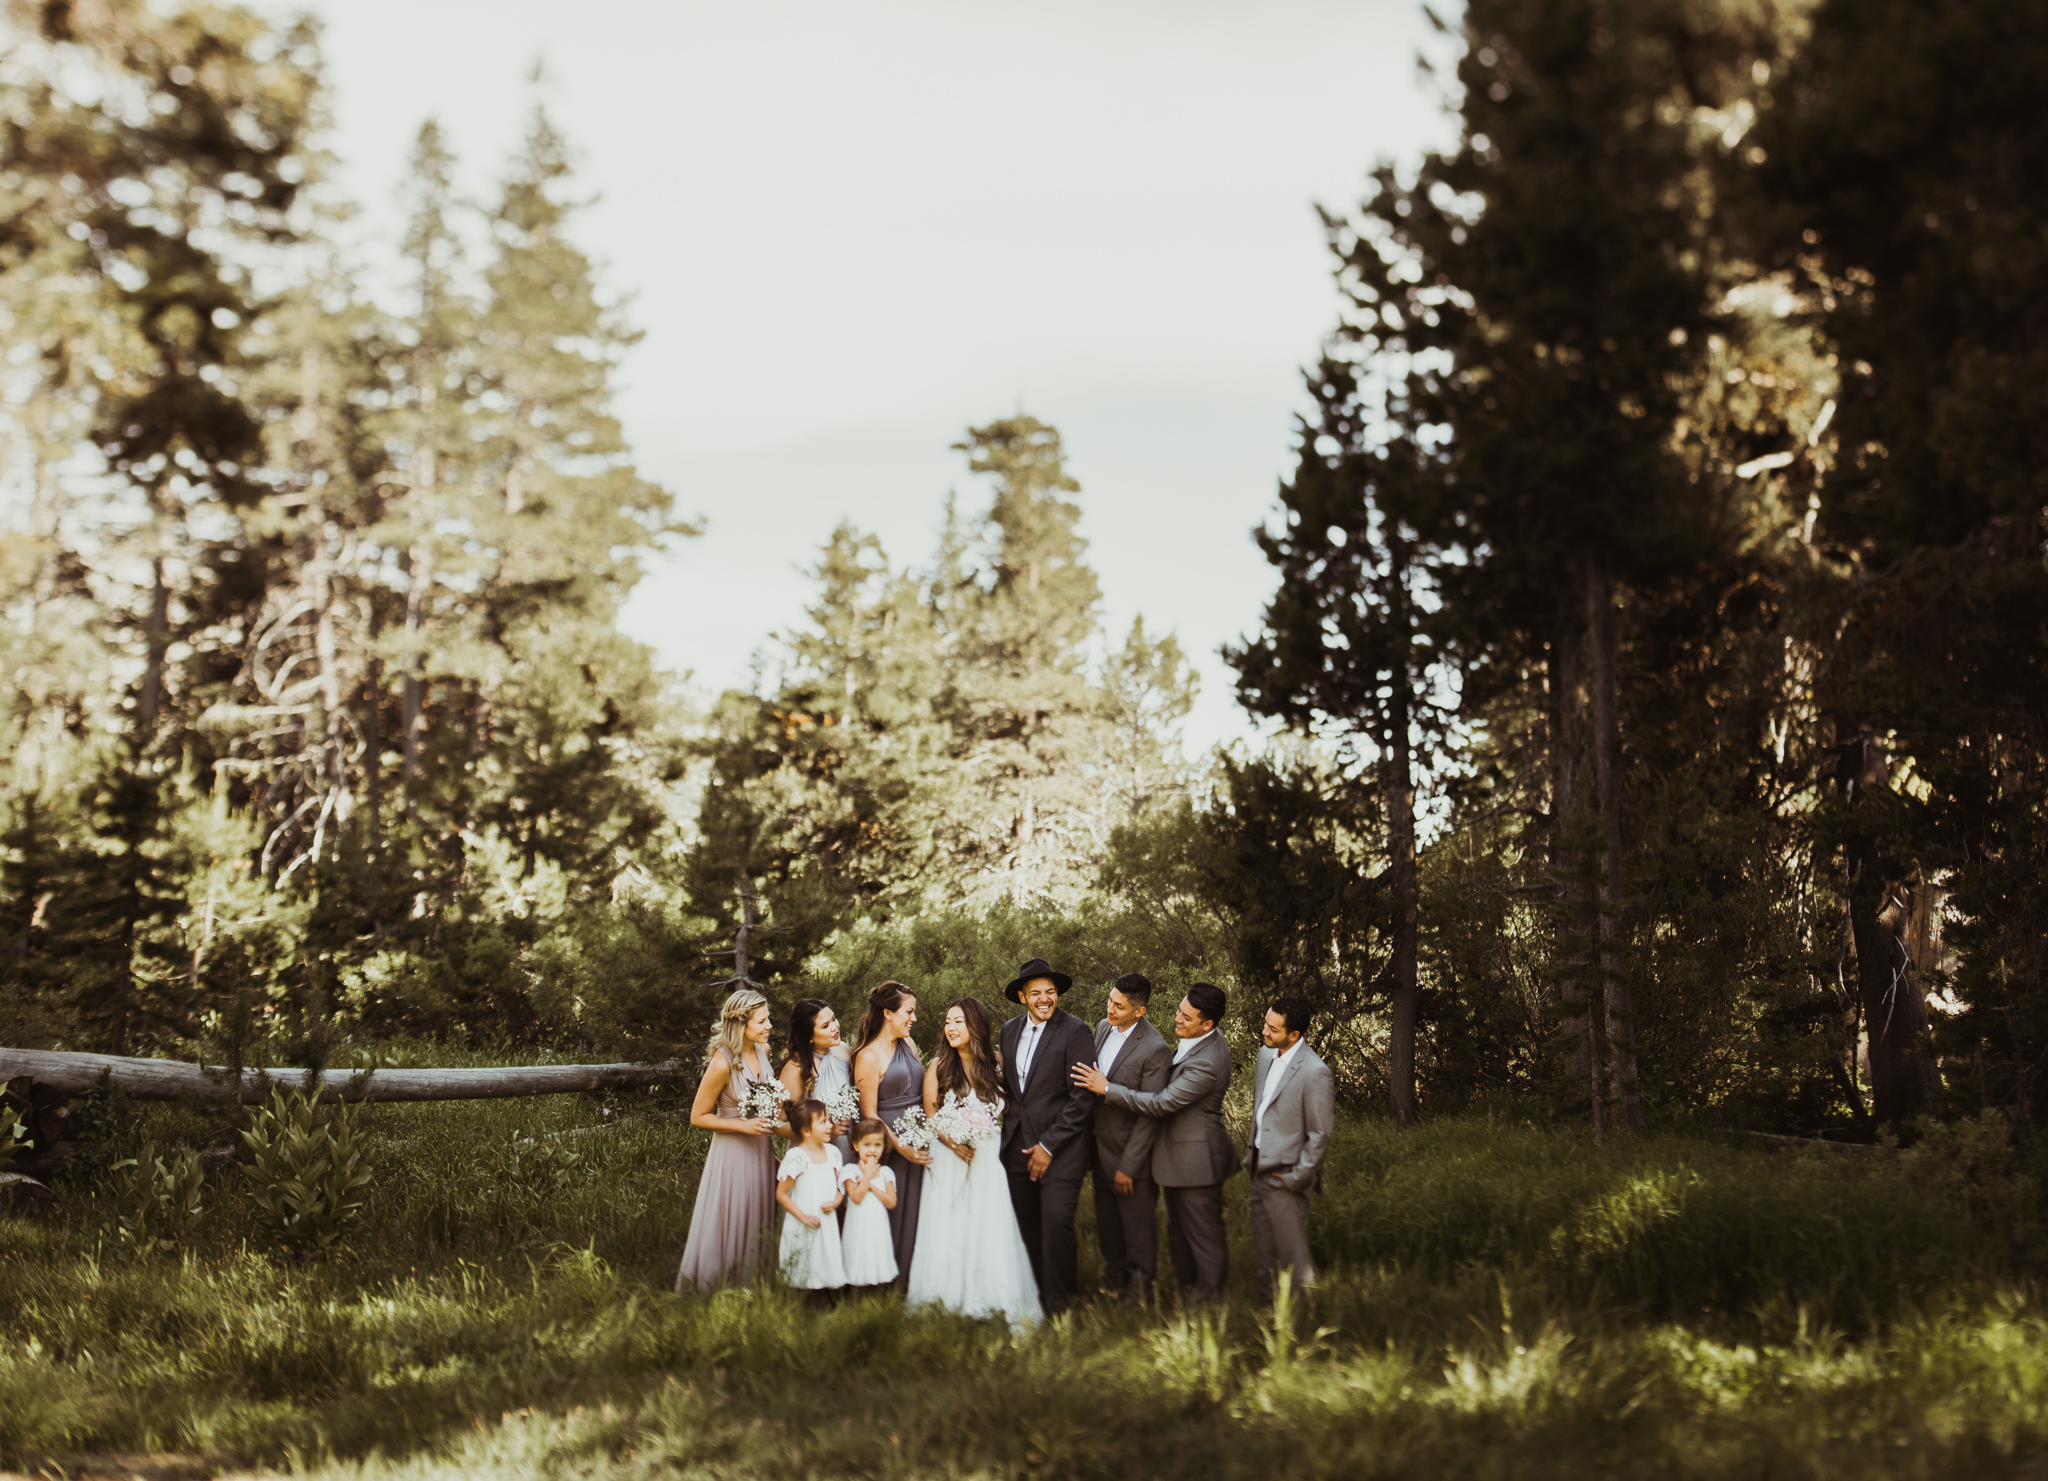 ©Isaiah & Taylor Photography -The Hideout Wedding, Kirkwood California, Lake Tahoe Wedding Photographer-118.jpg